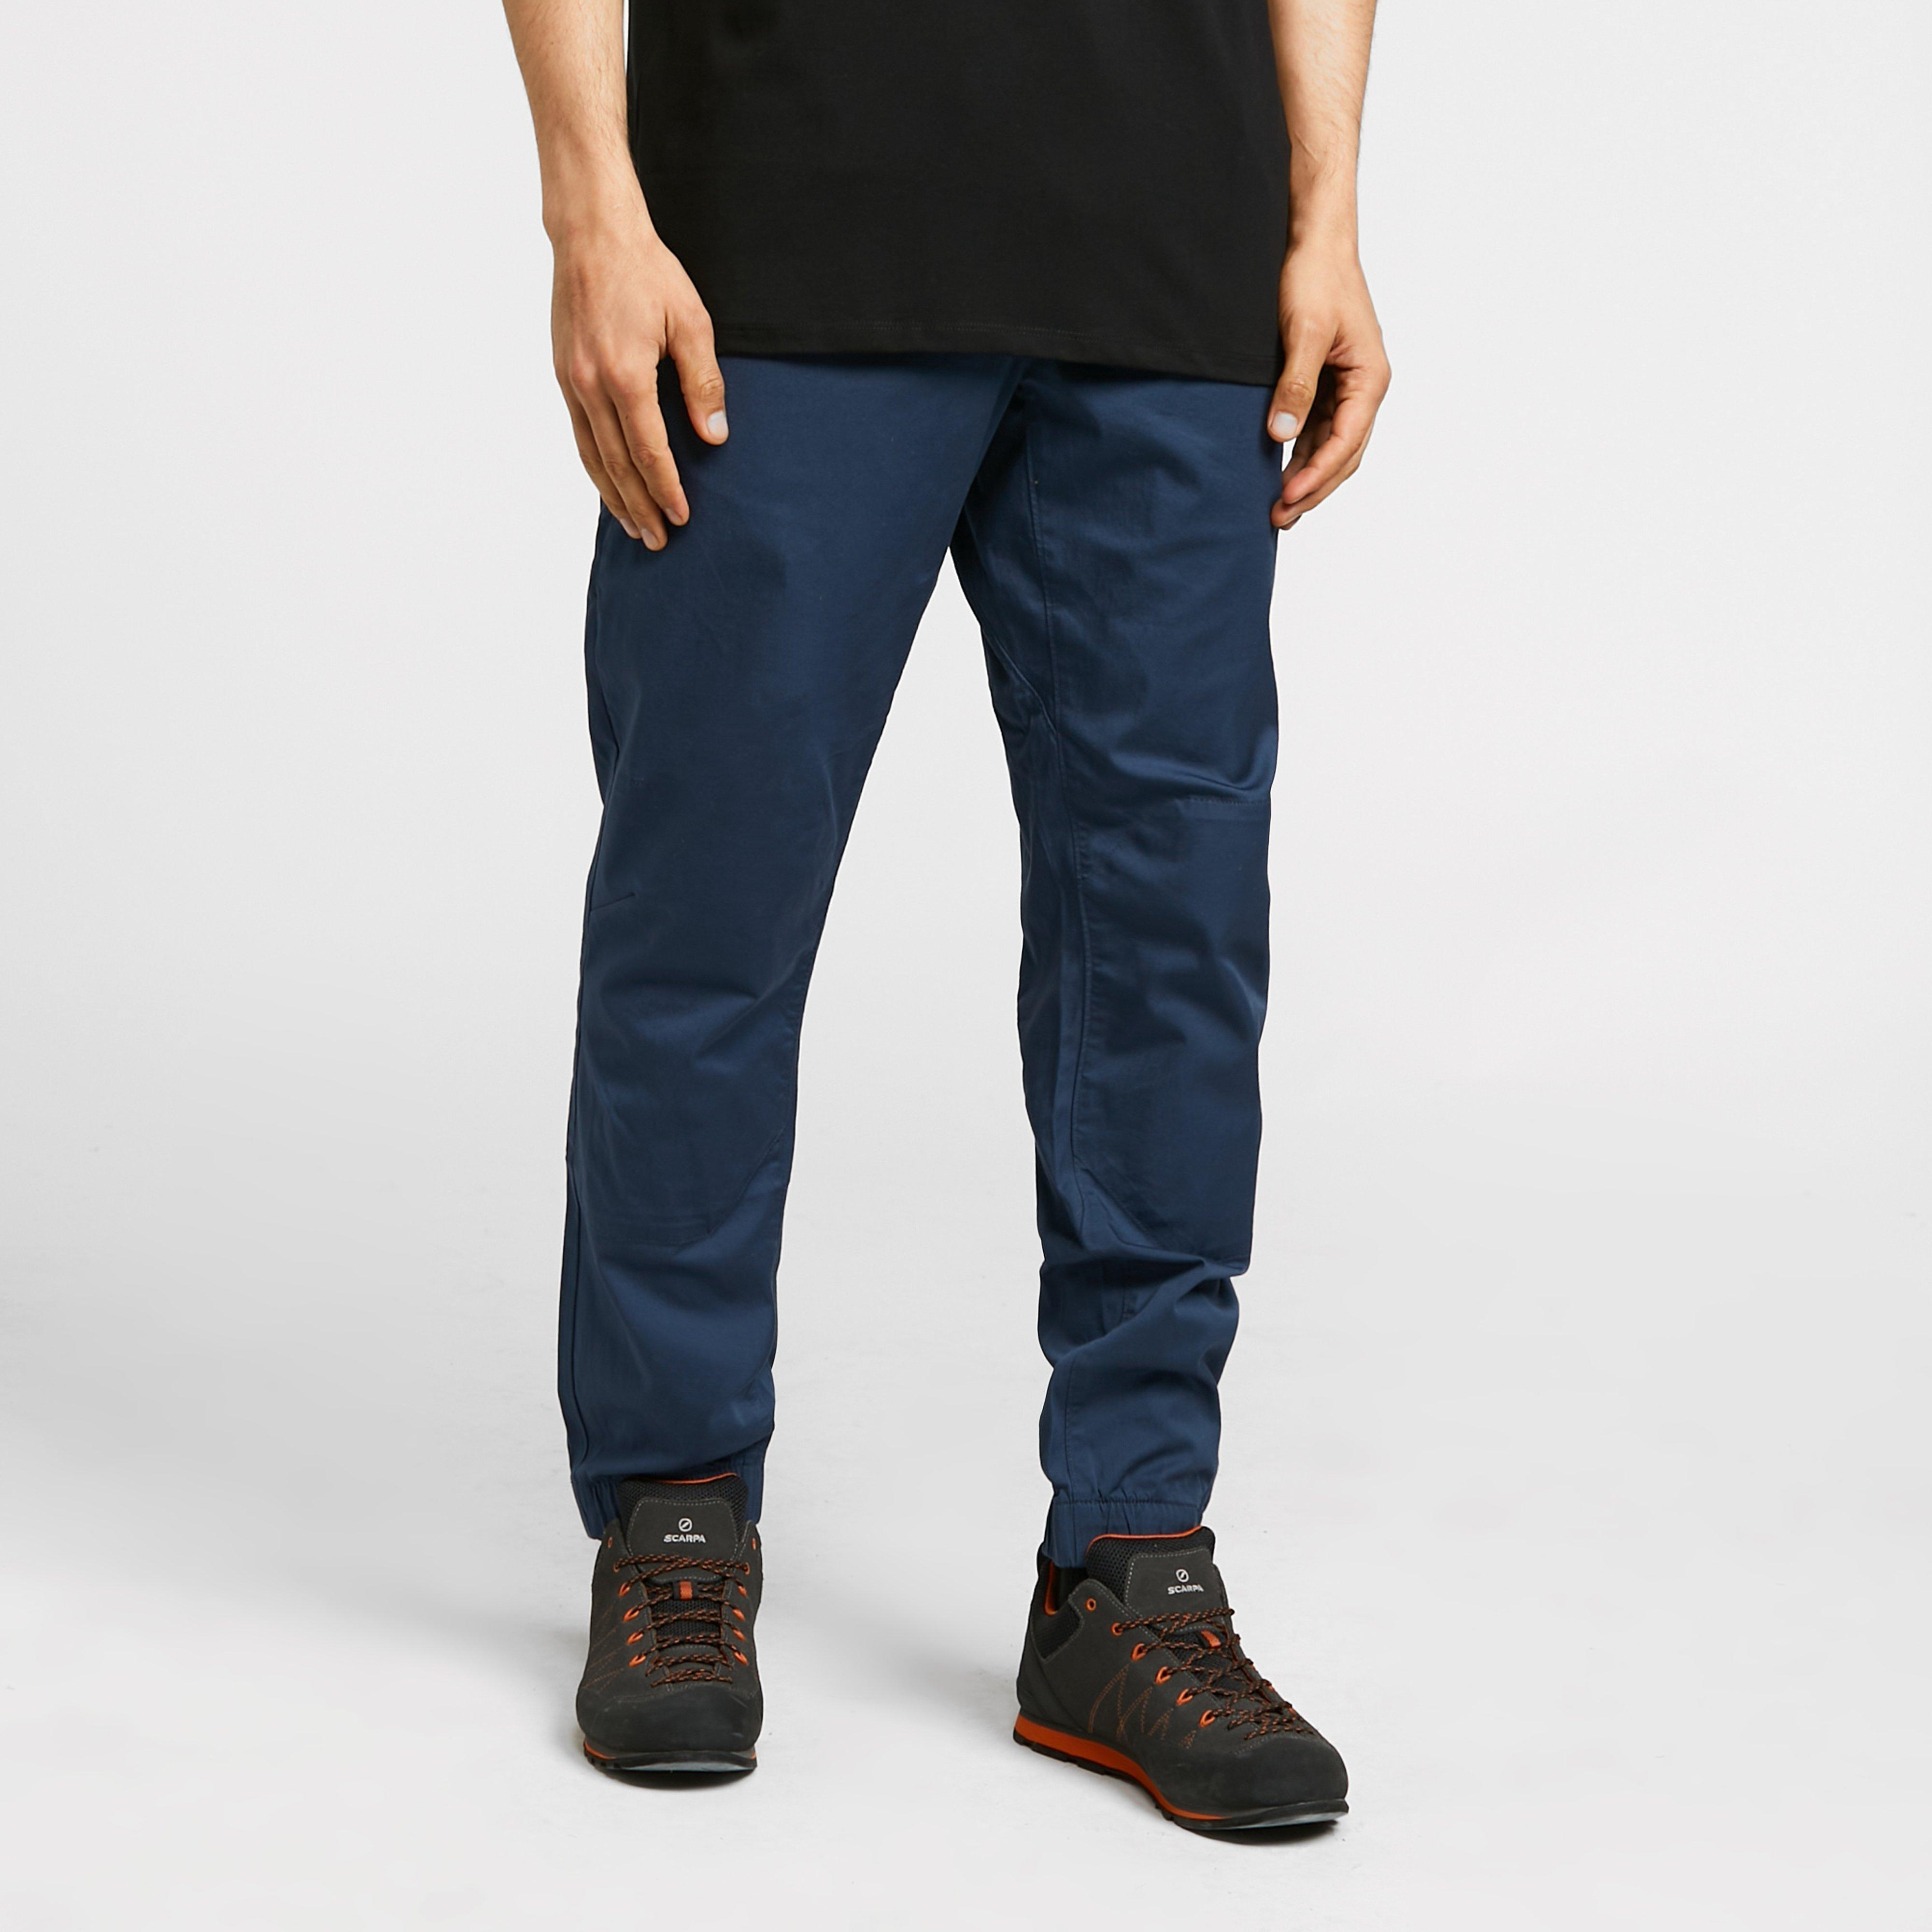 Black Diamond Mens Notion Pants - Blue/pants  Blue/pants